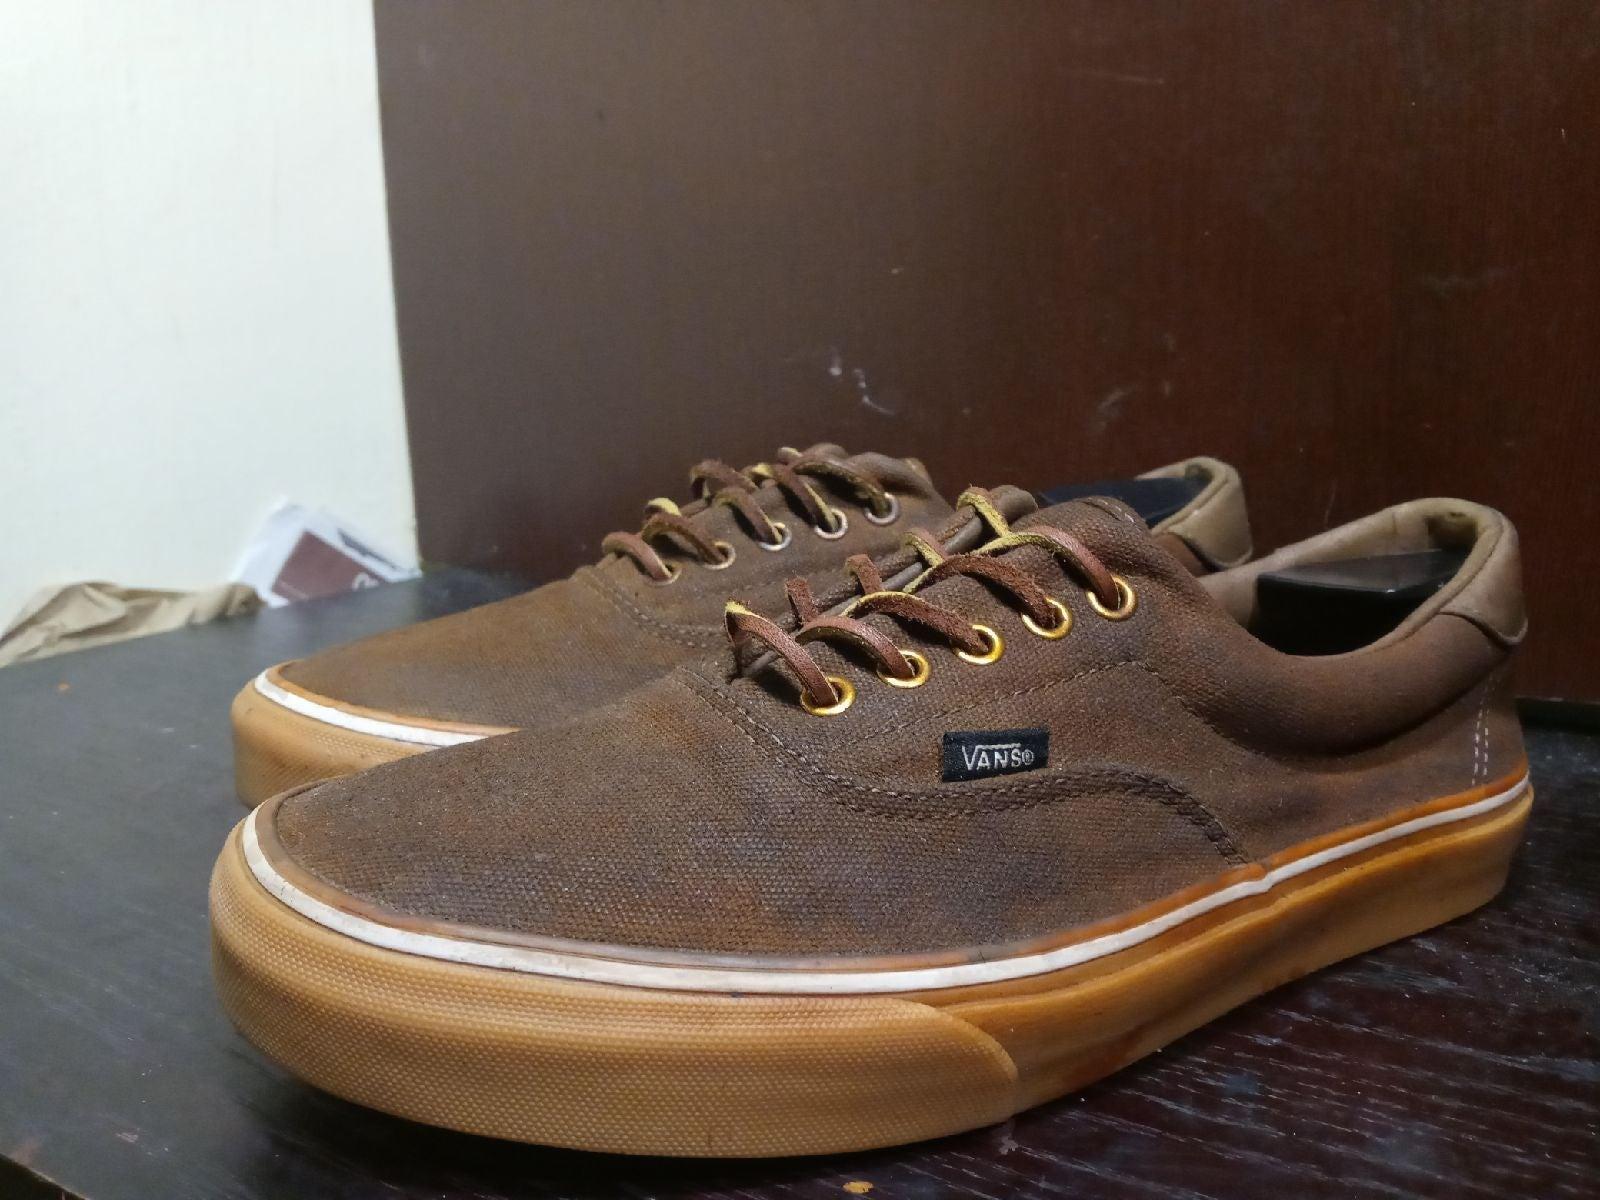 VANS Gum Sole Shoes for Men | Mercari